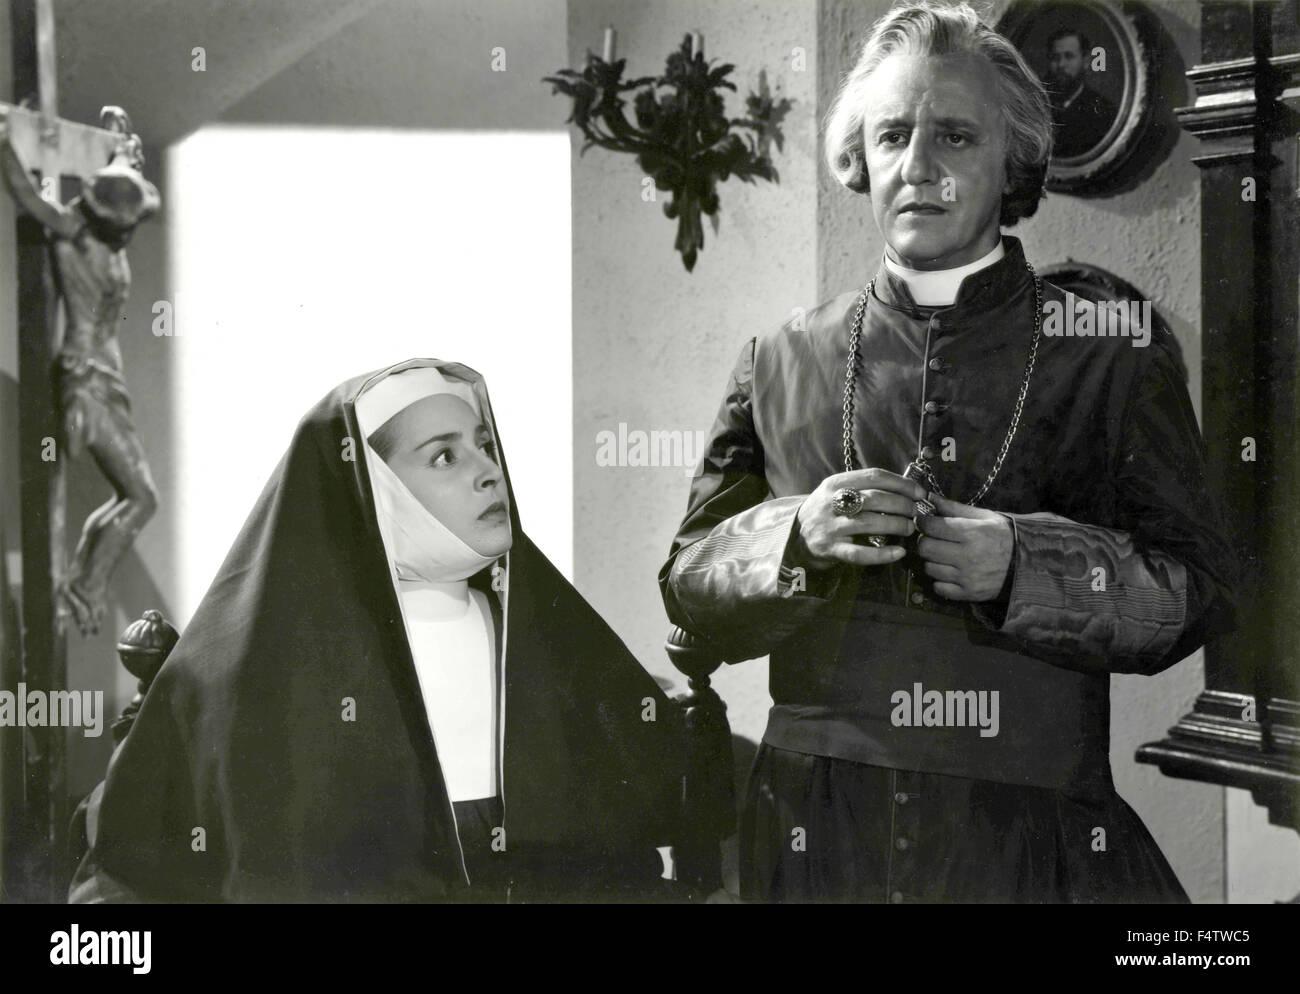 Italian actress Lea Padovani plays Sister Teresa in the movie 'The great renunciation', Italy - Stock Image